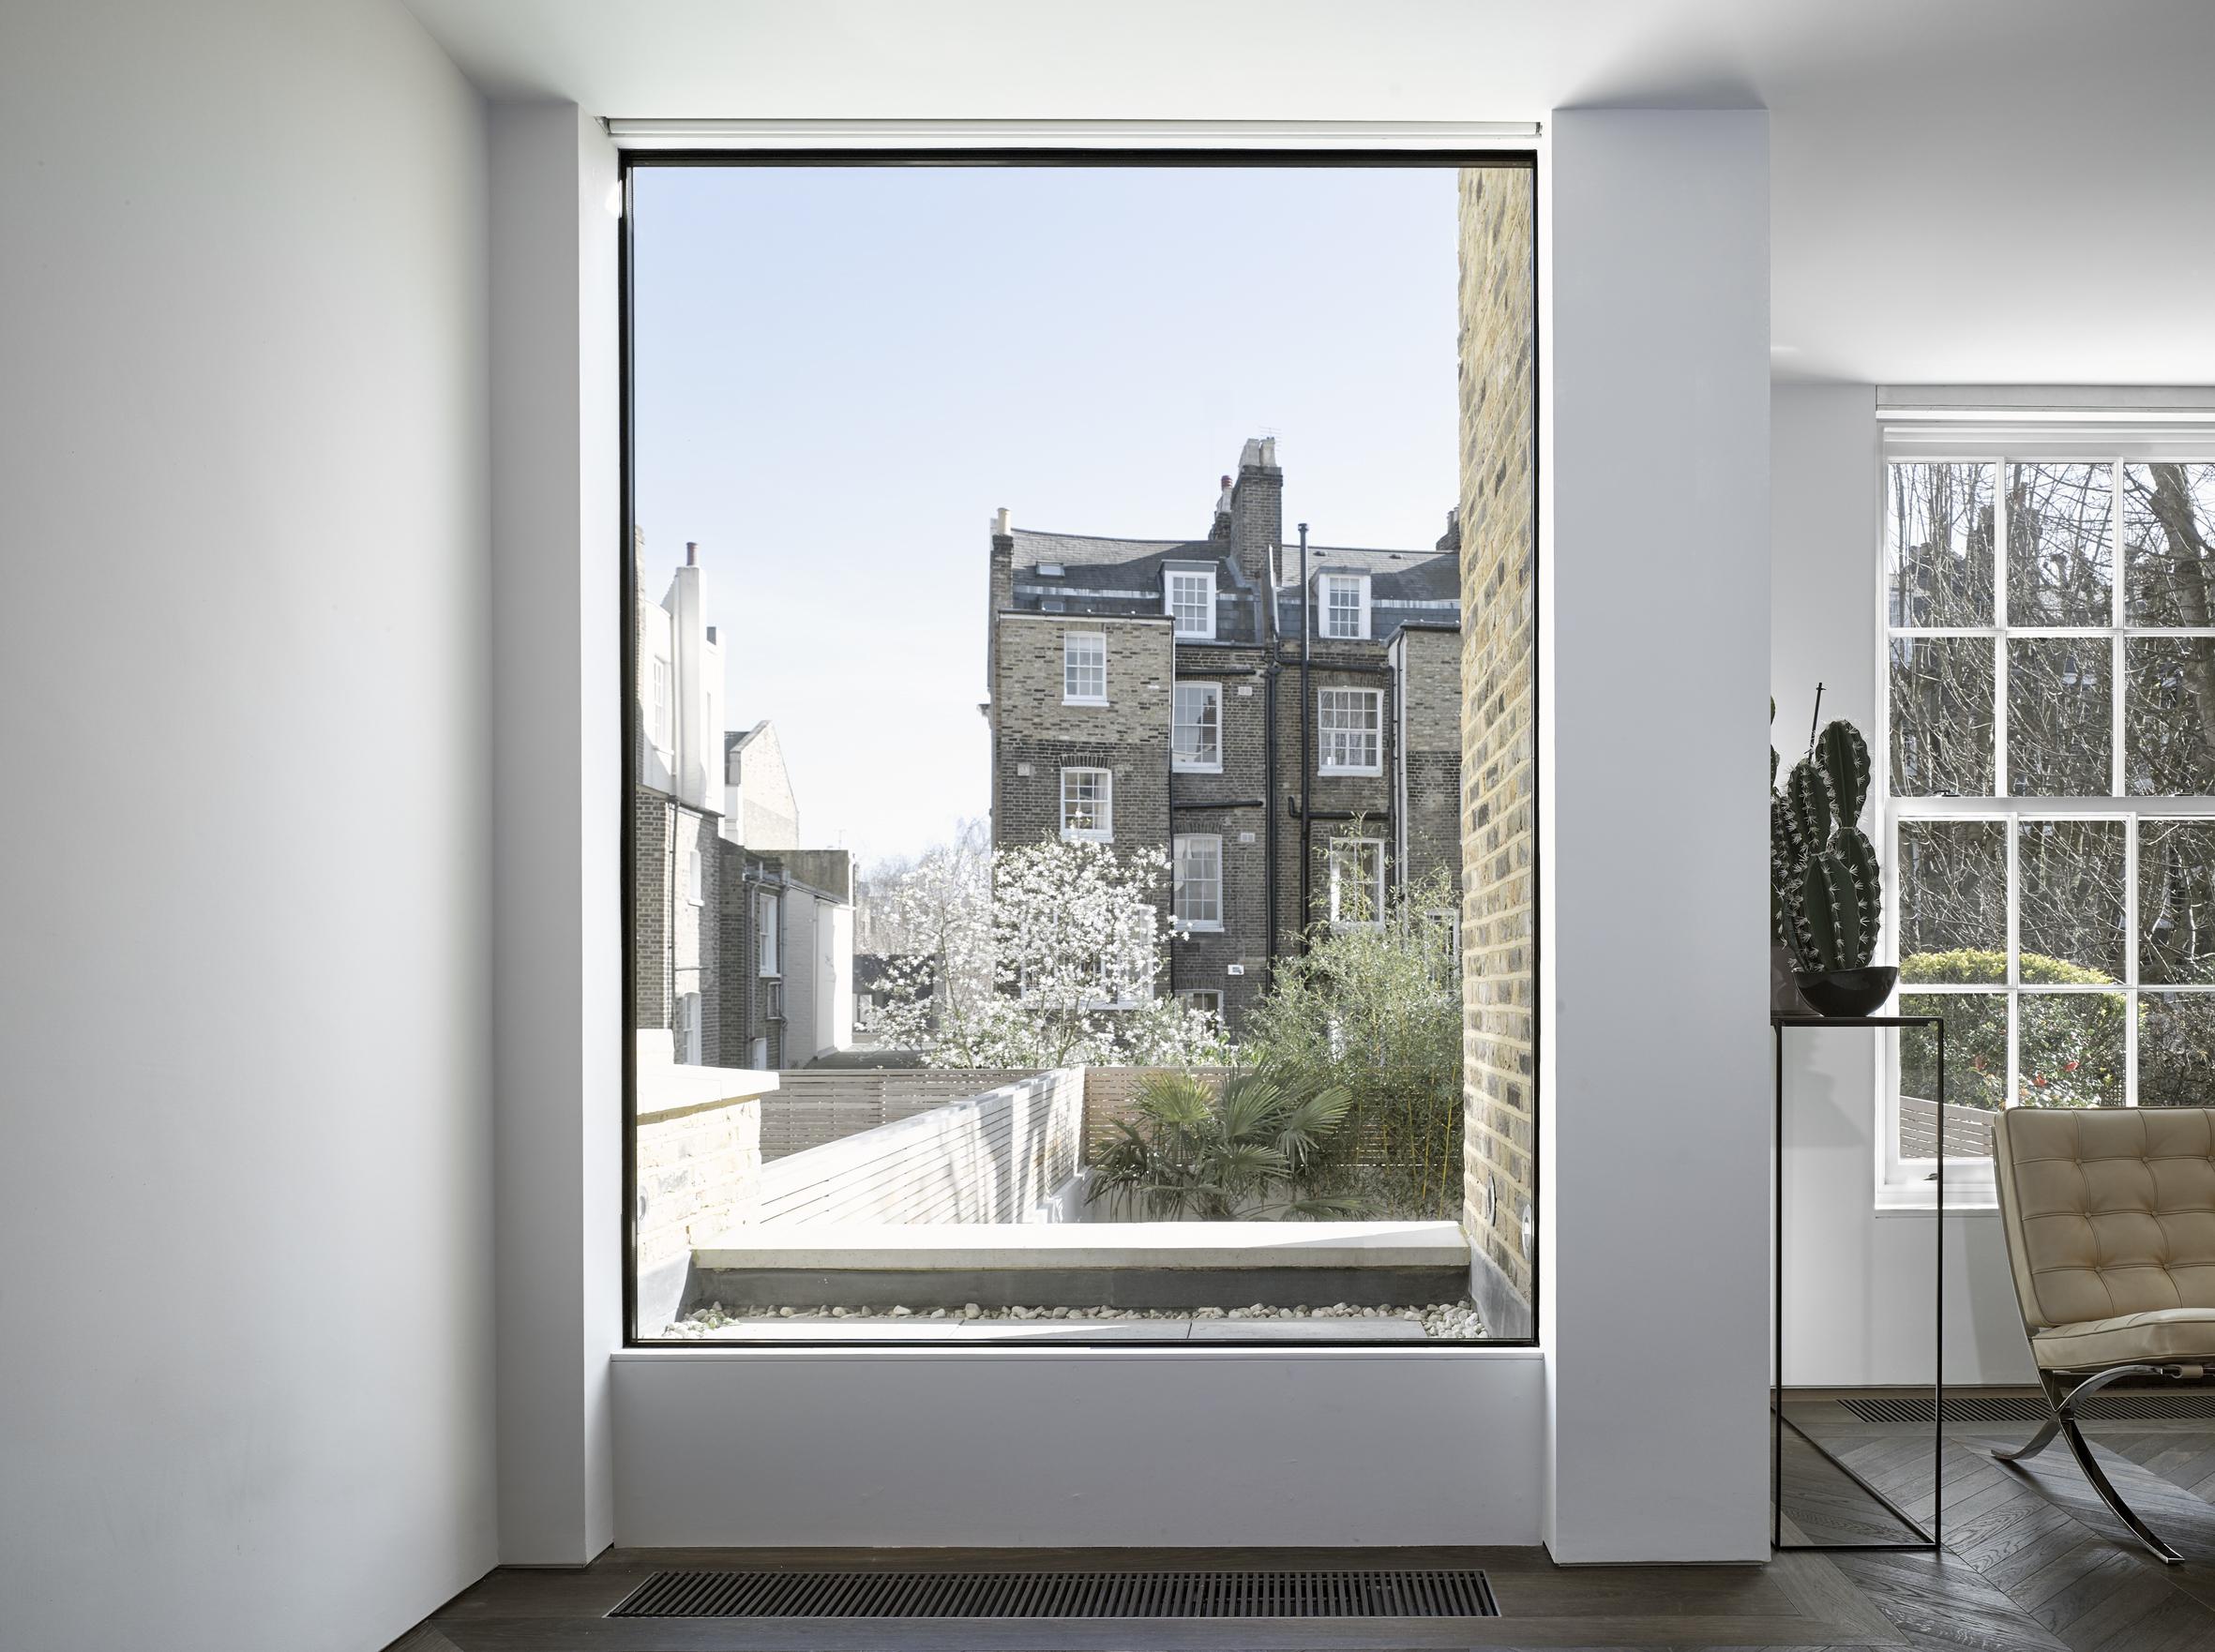 NGUT-1280-JL Architects-0007R.jpg